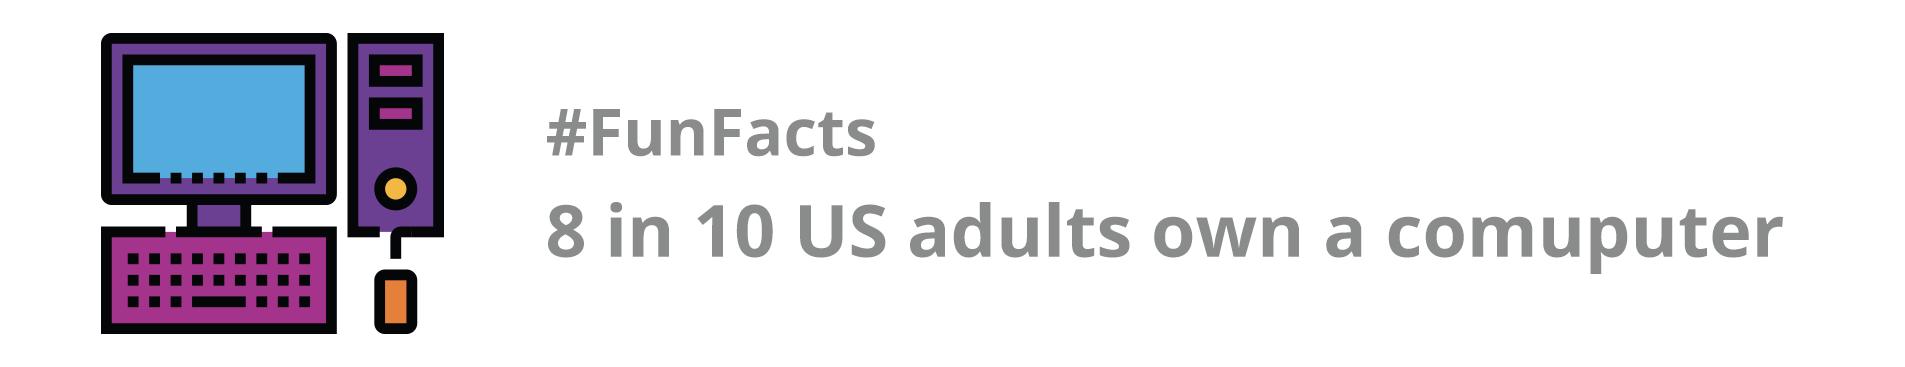 Computer Stat